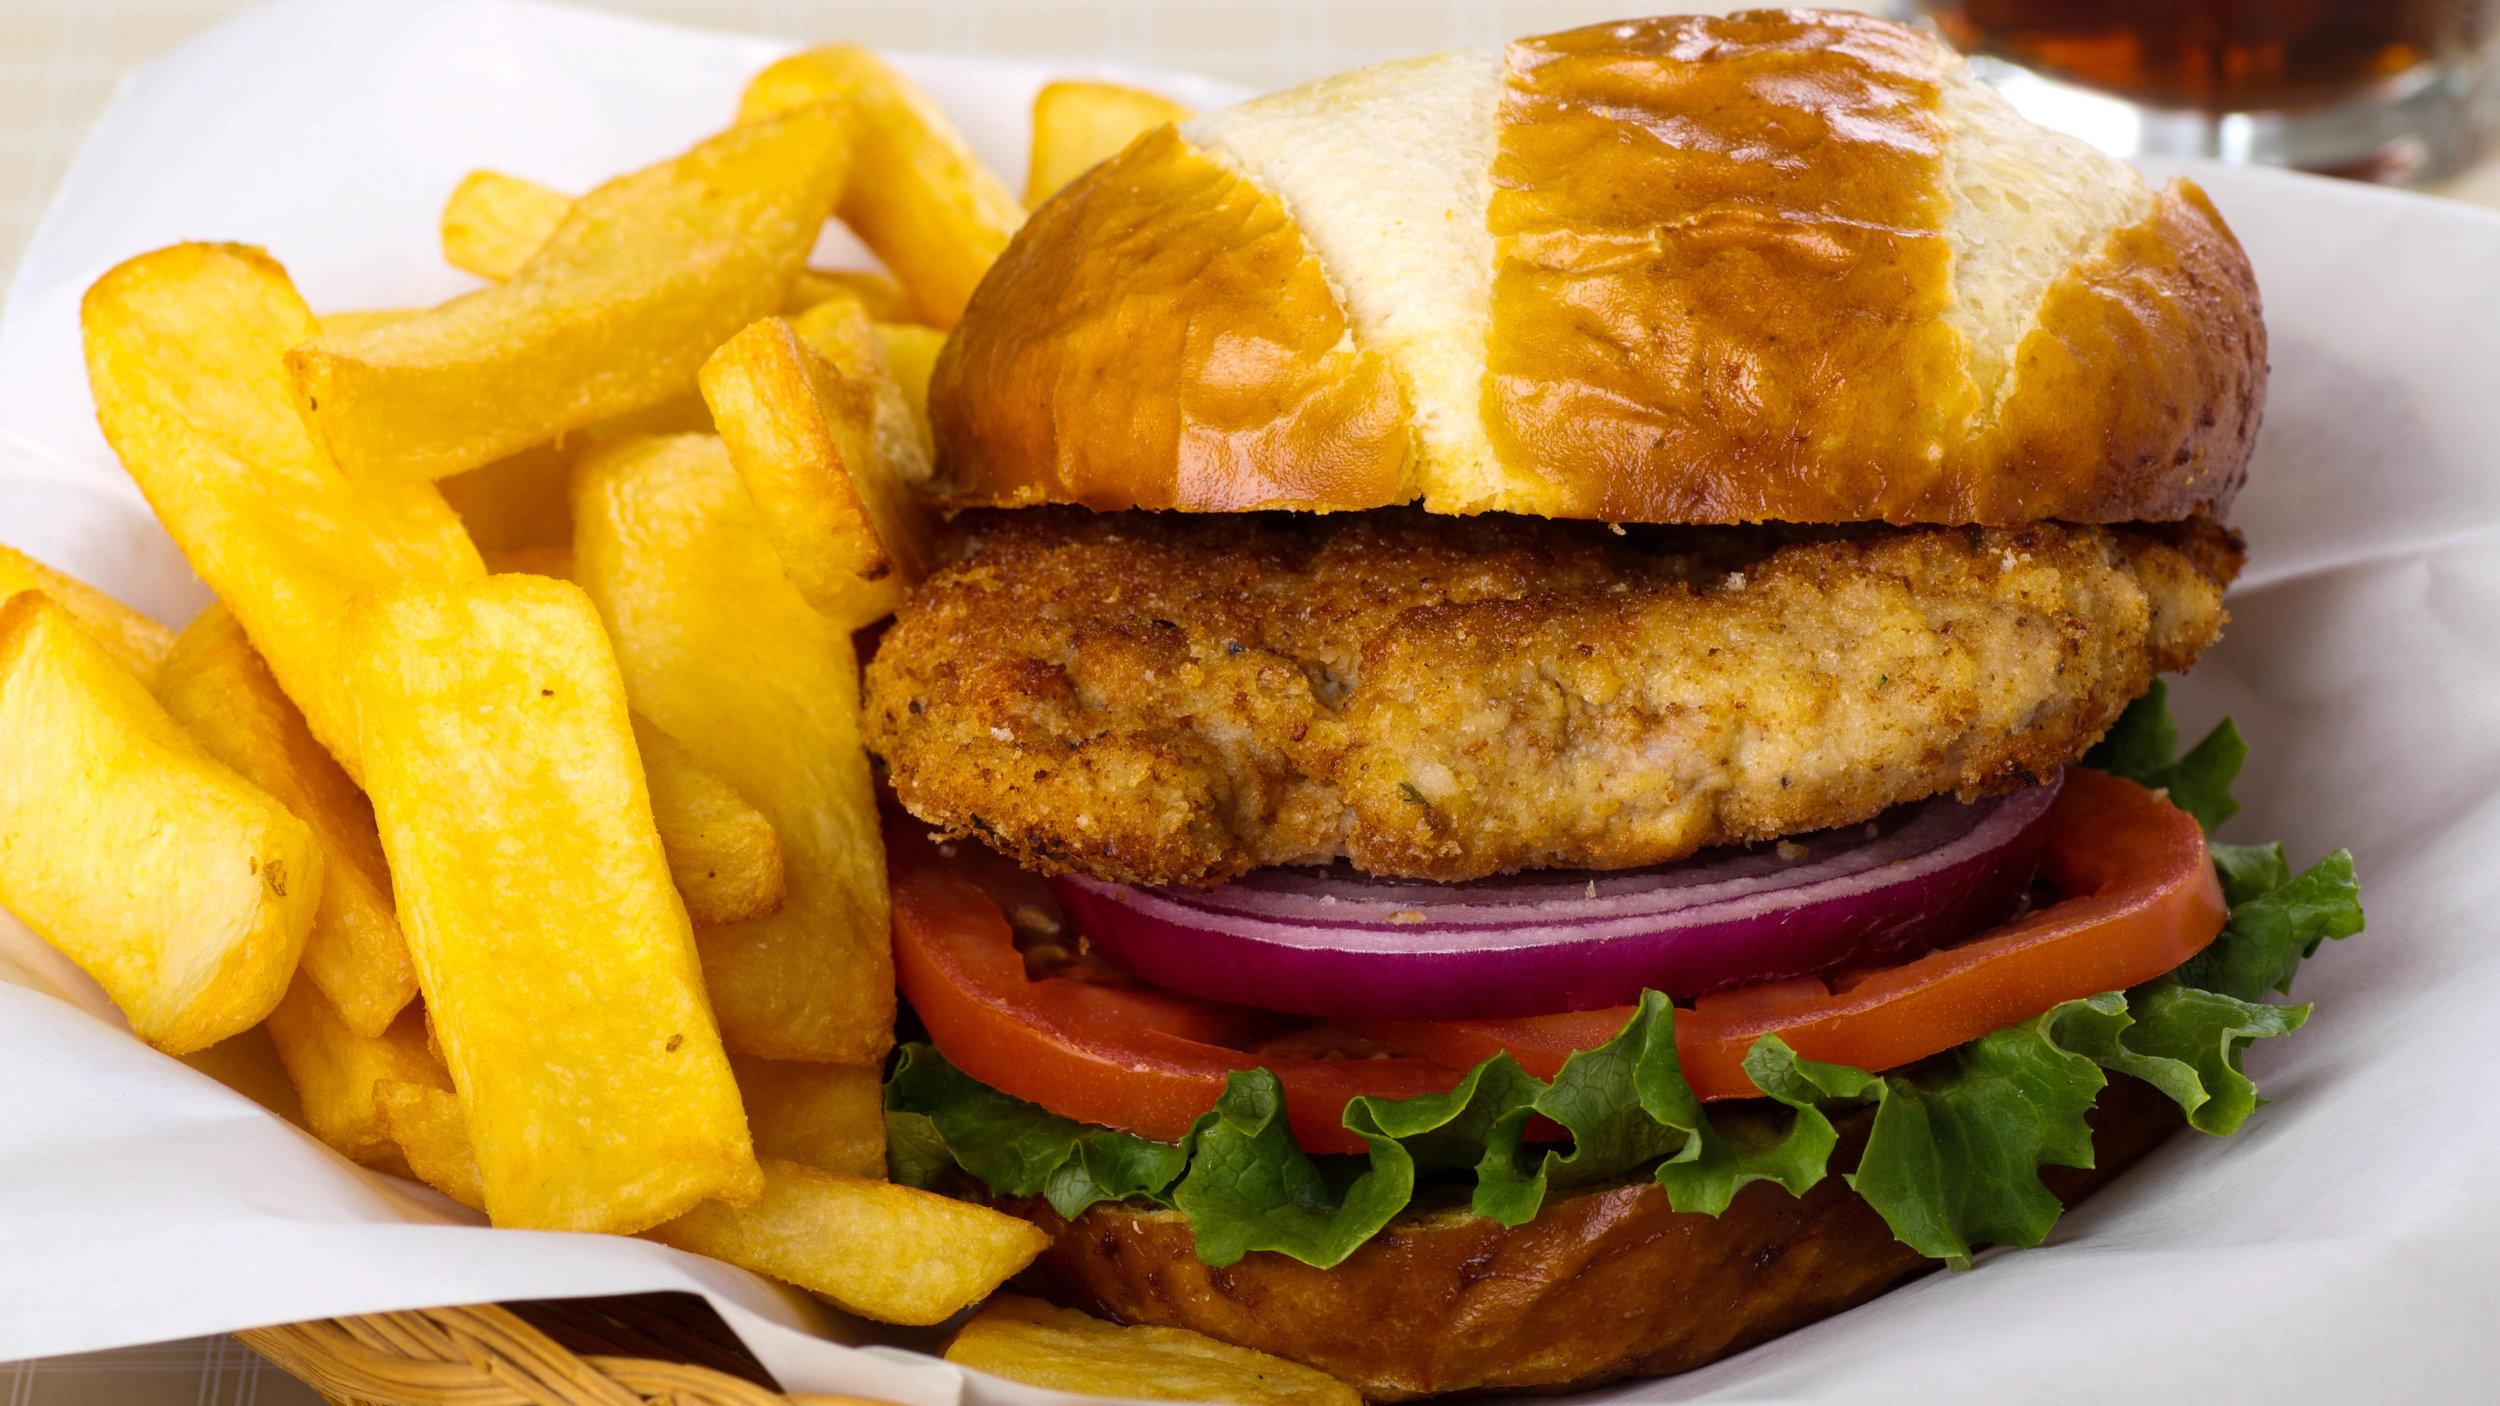 sandwich-2-alr-c169-169.jpg